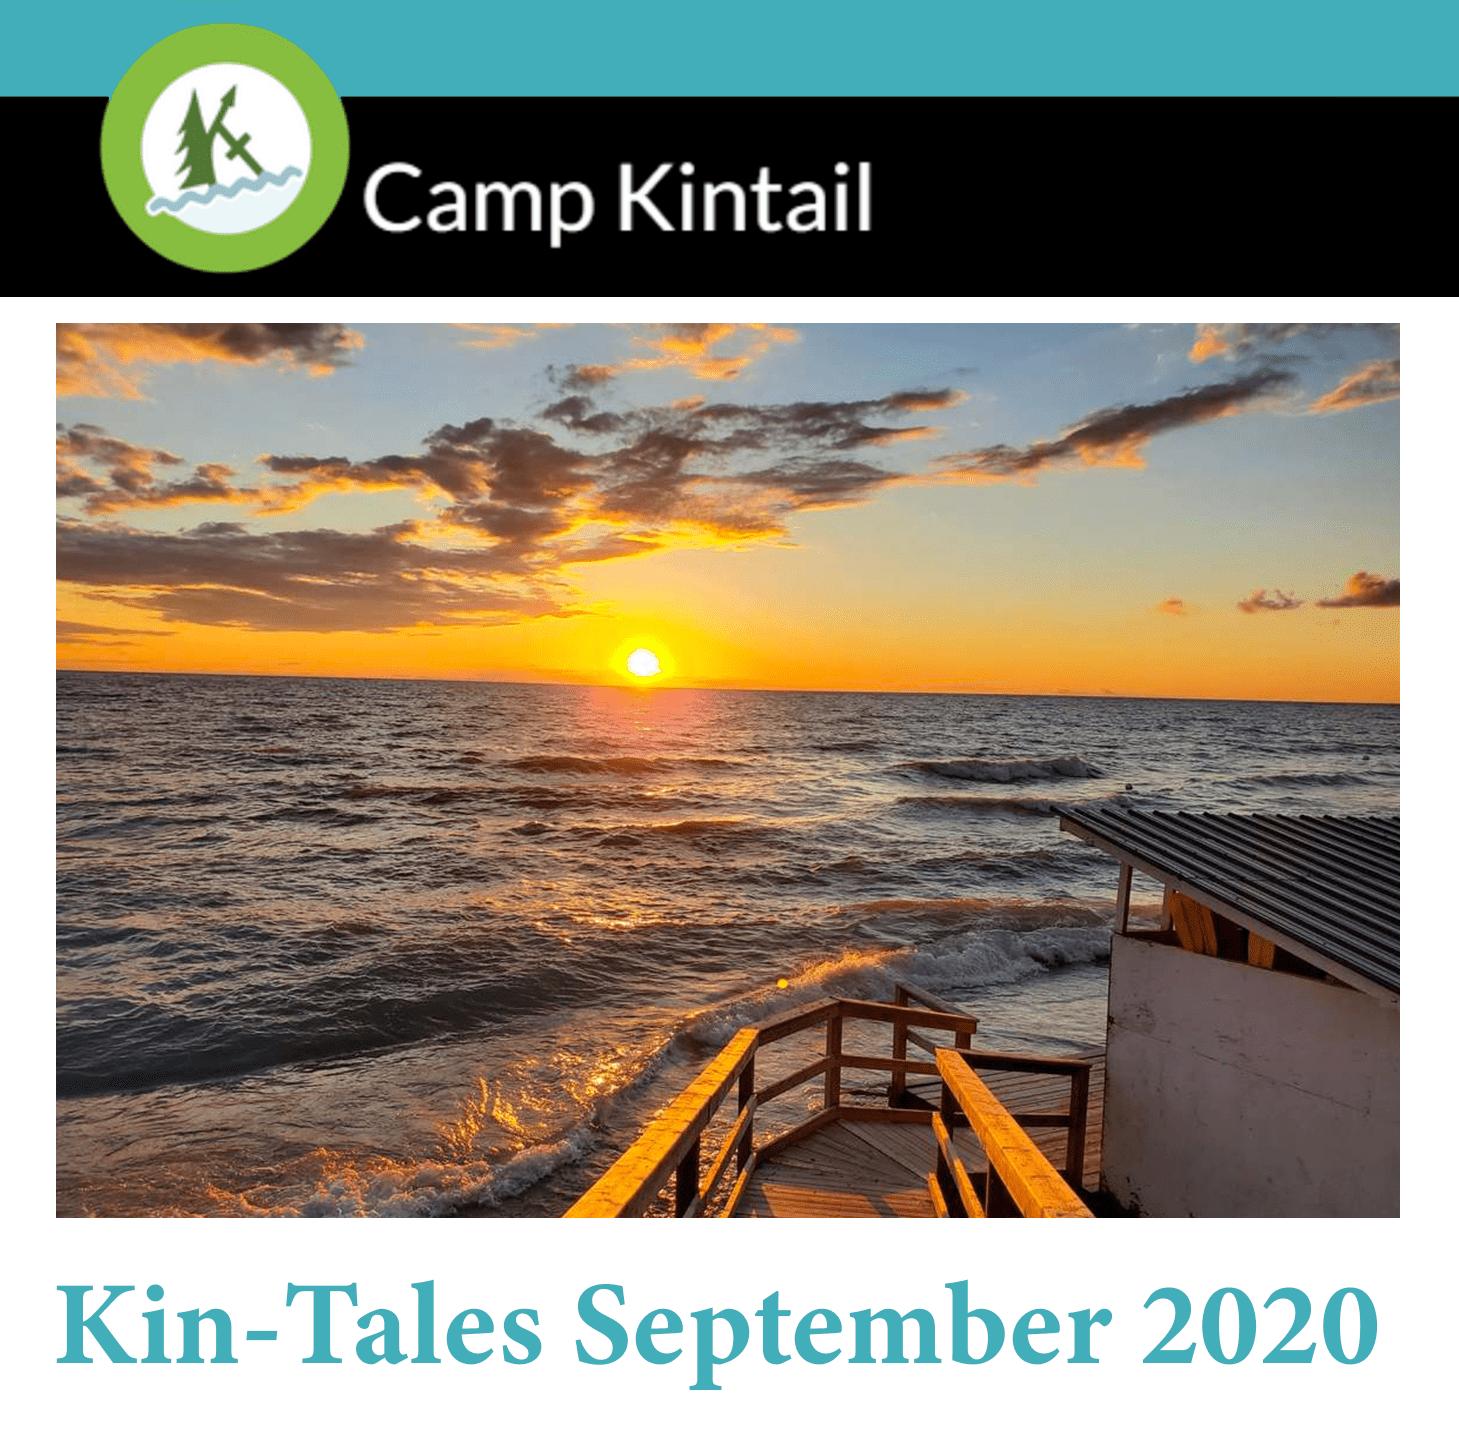 Title Text: Kin-Tales September 2020. Image: Sunset on Lake Huron.